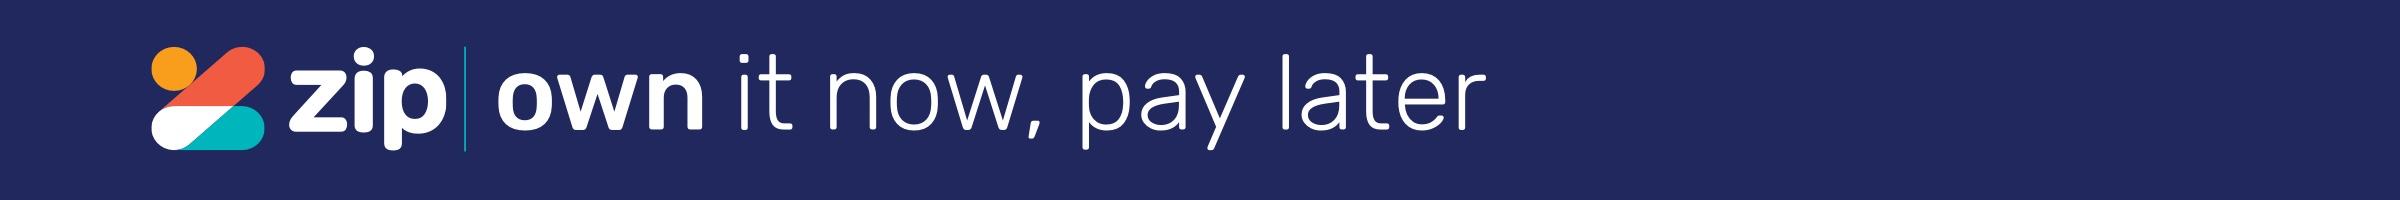 Zip-Pay_Custom_Banner_Strip_Navy.jpg